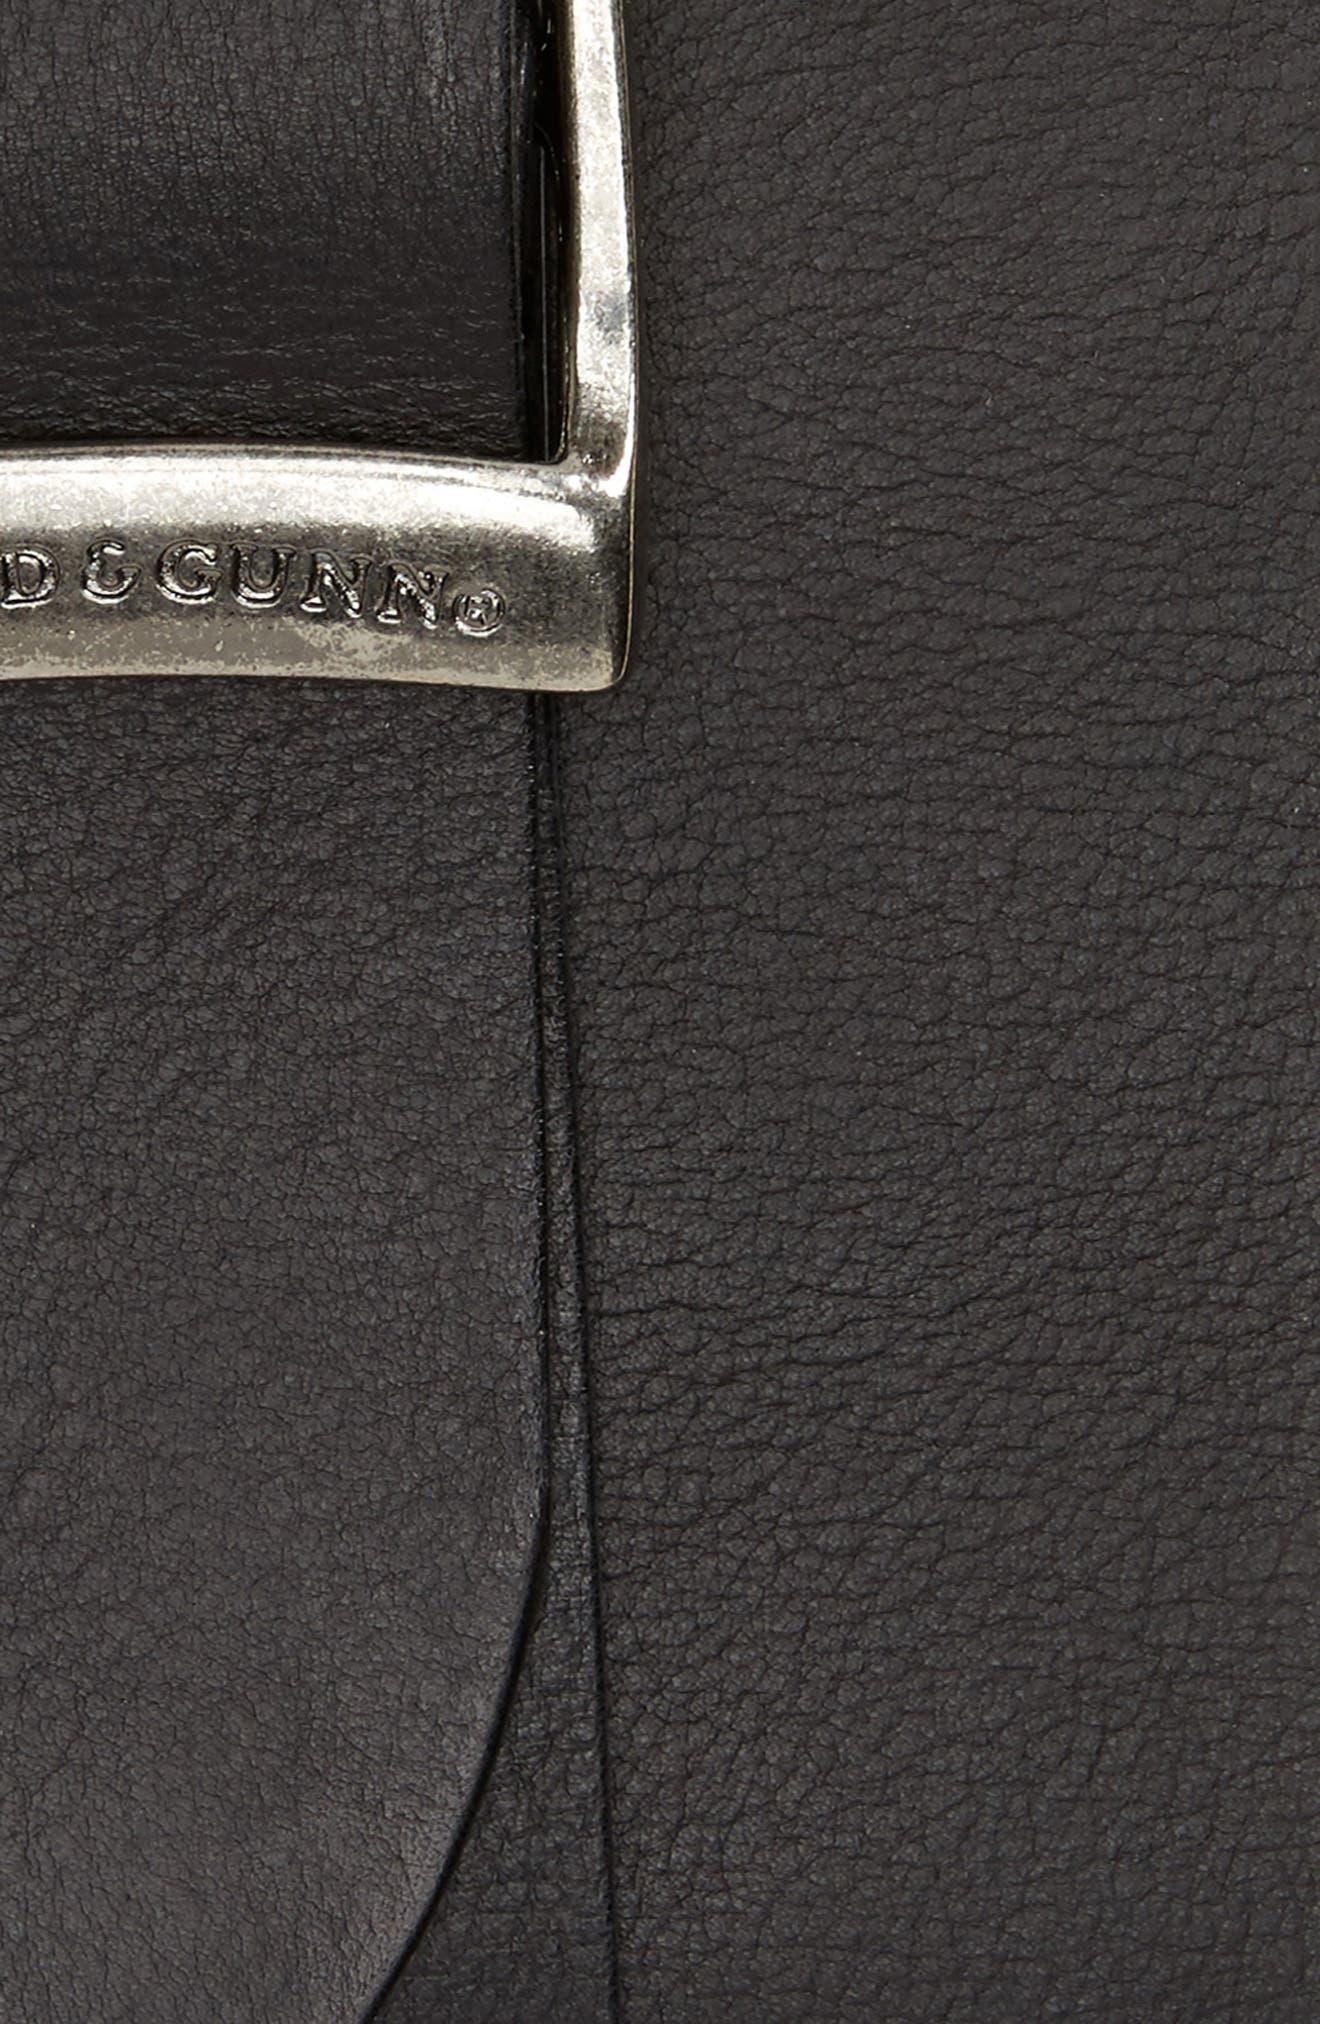 Cornonet Crescent Leather Belt,                             Alternate thumbnail 2, color,                             Nero